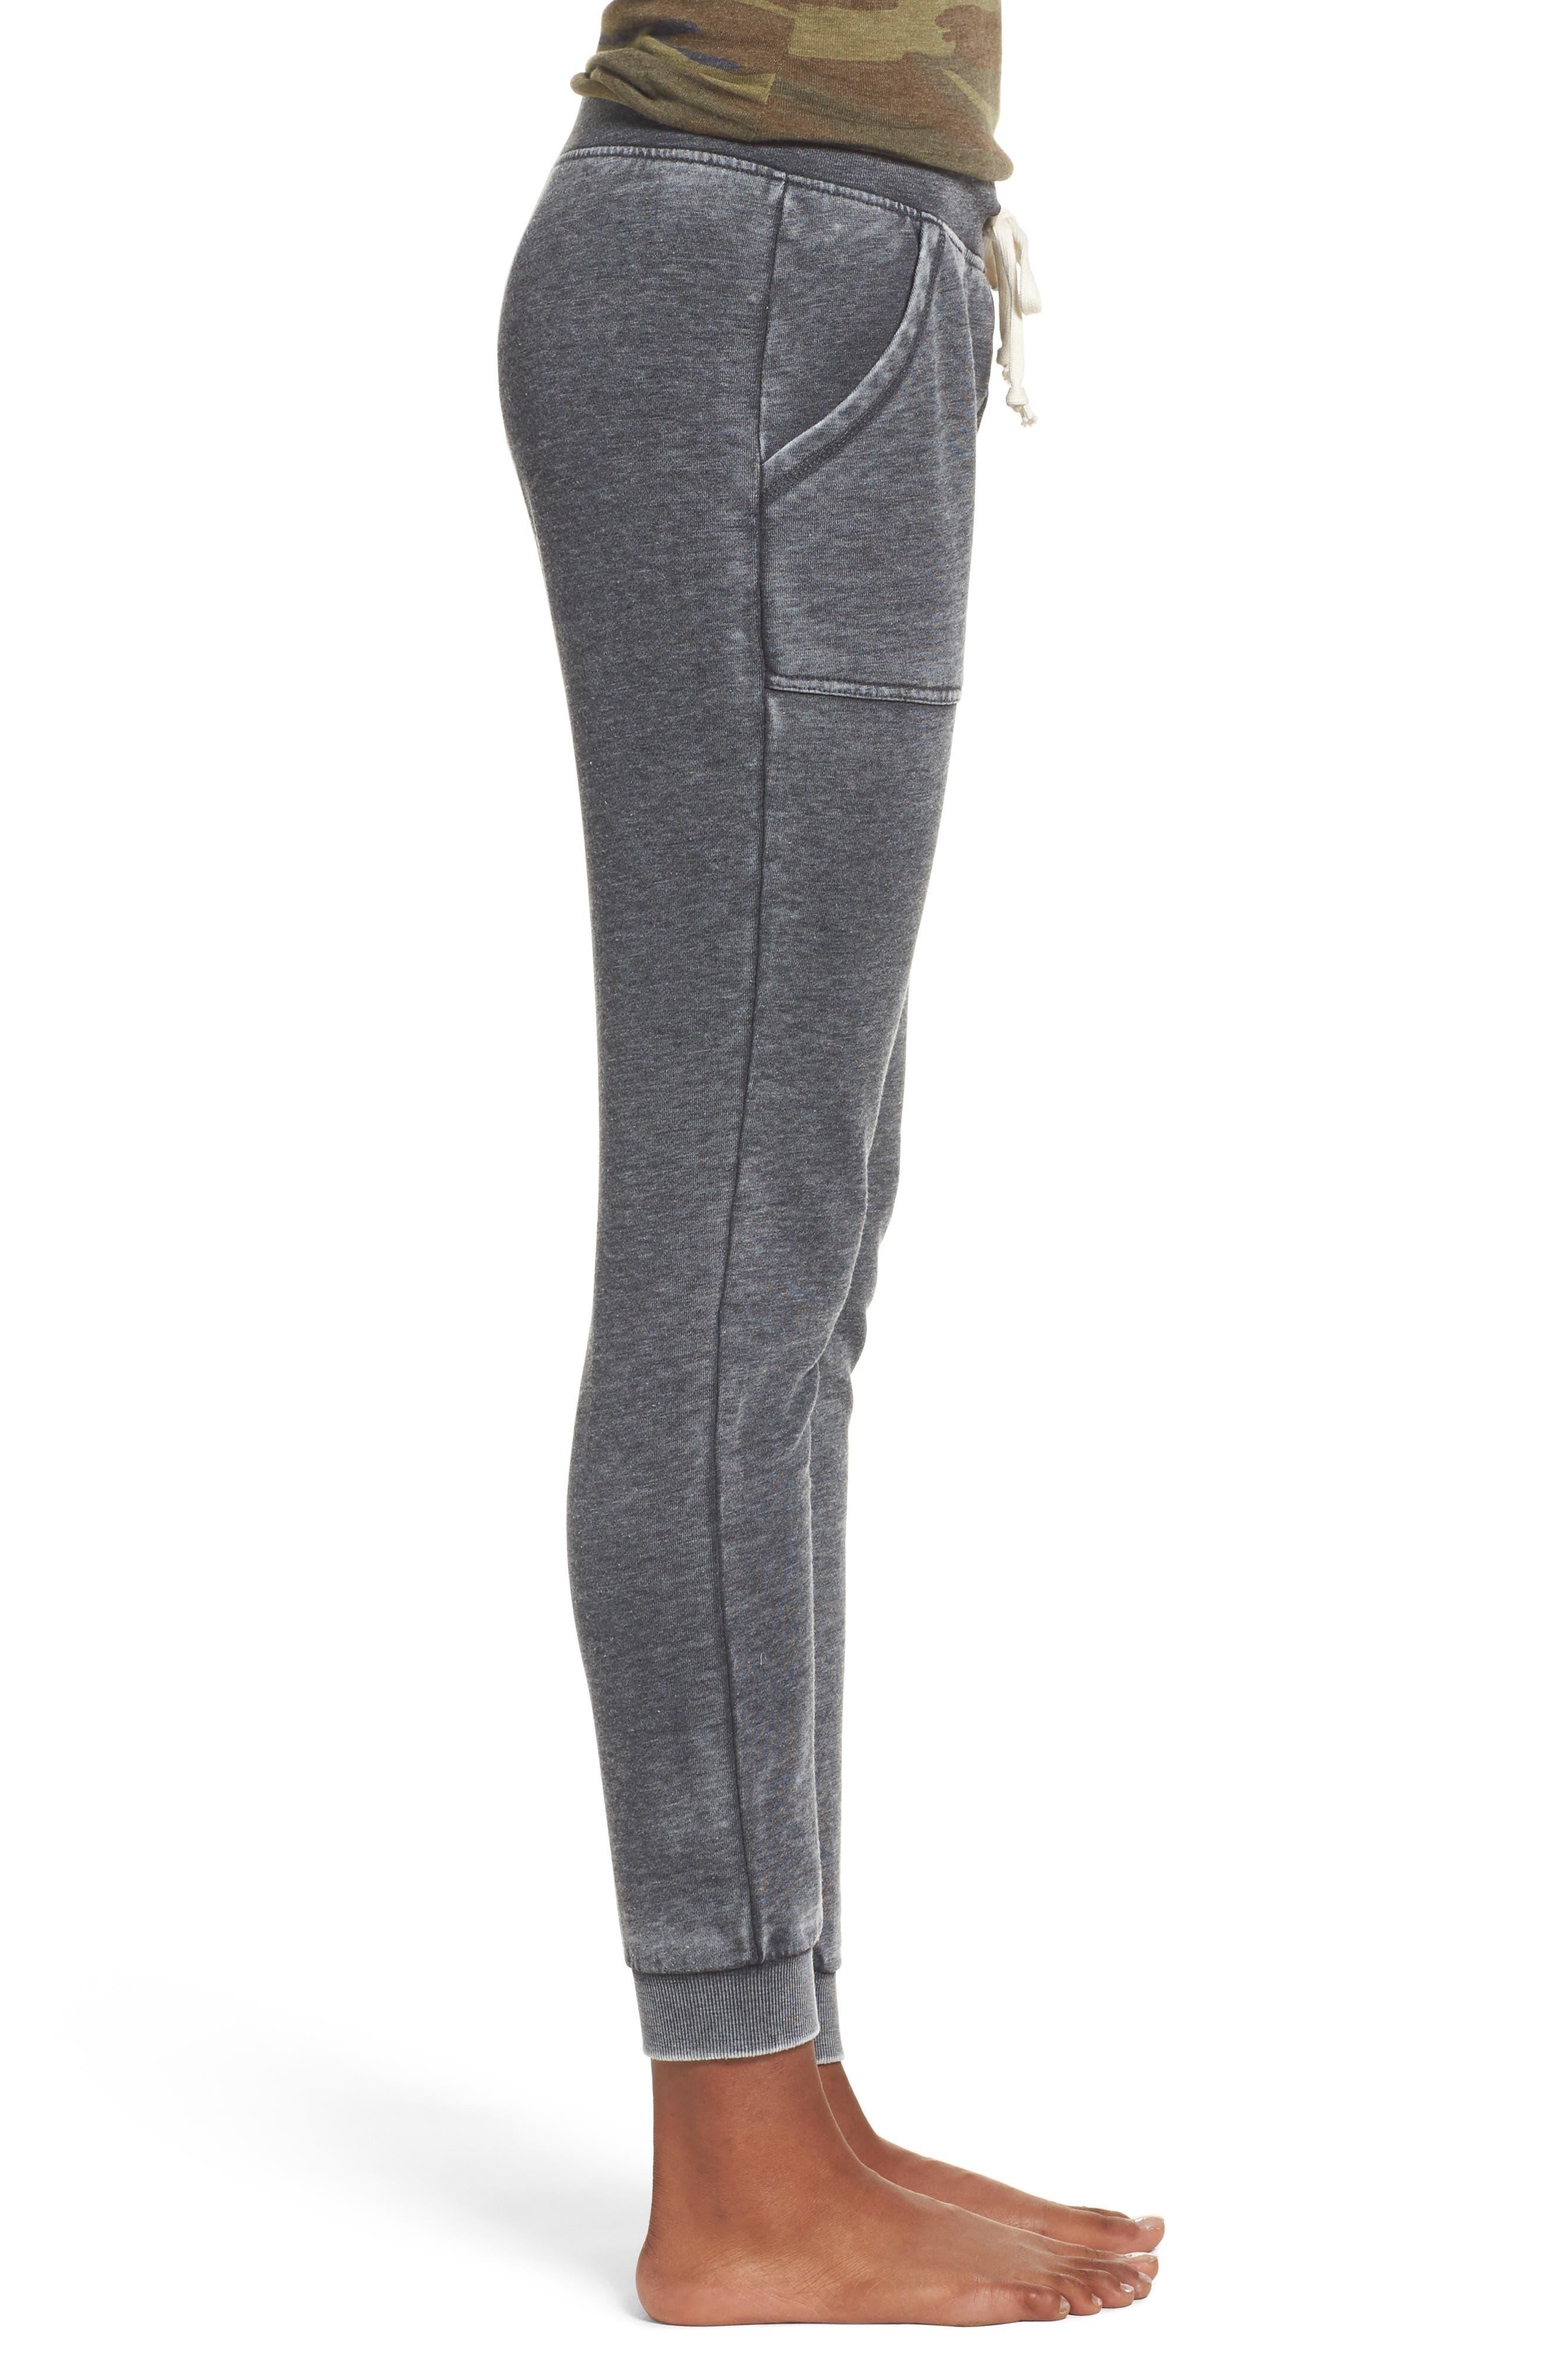 Long Weekend Pants,                             Alternate thumbnail 3, color,                             Washed Black